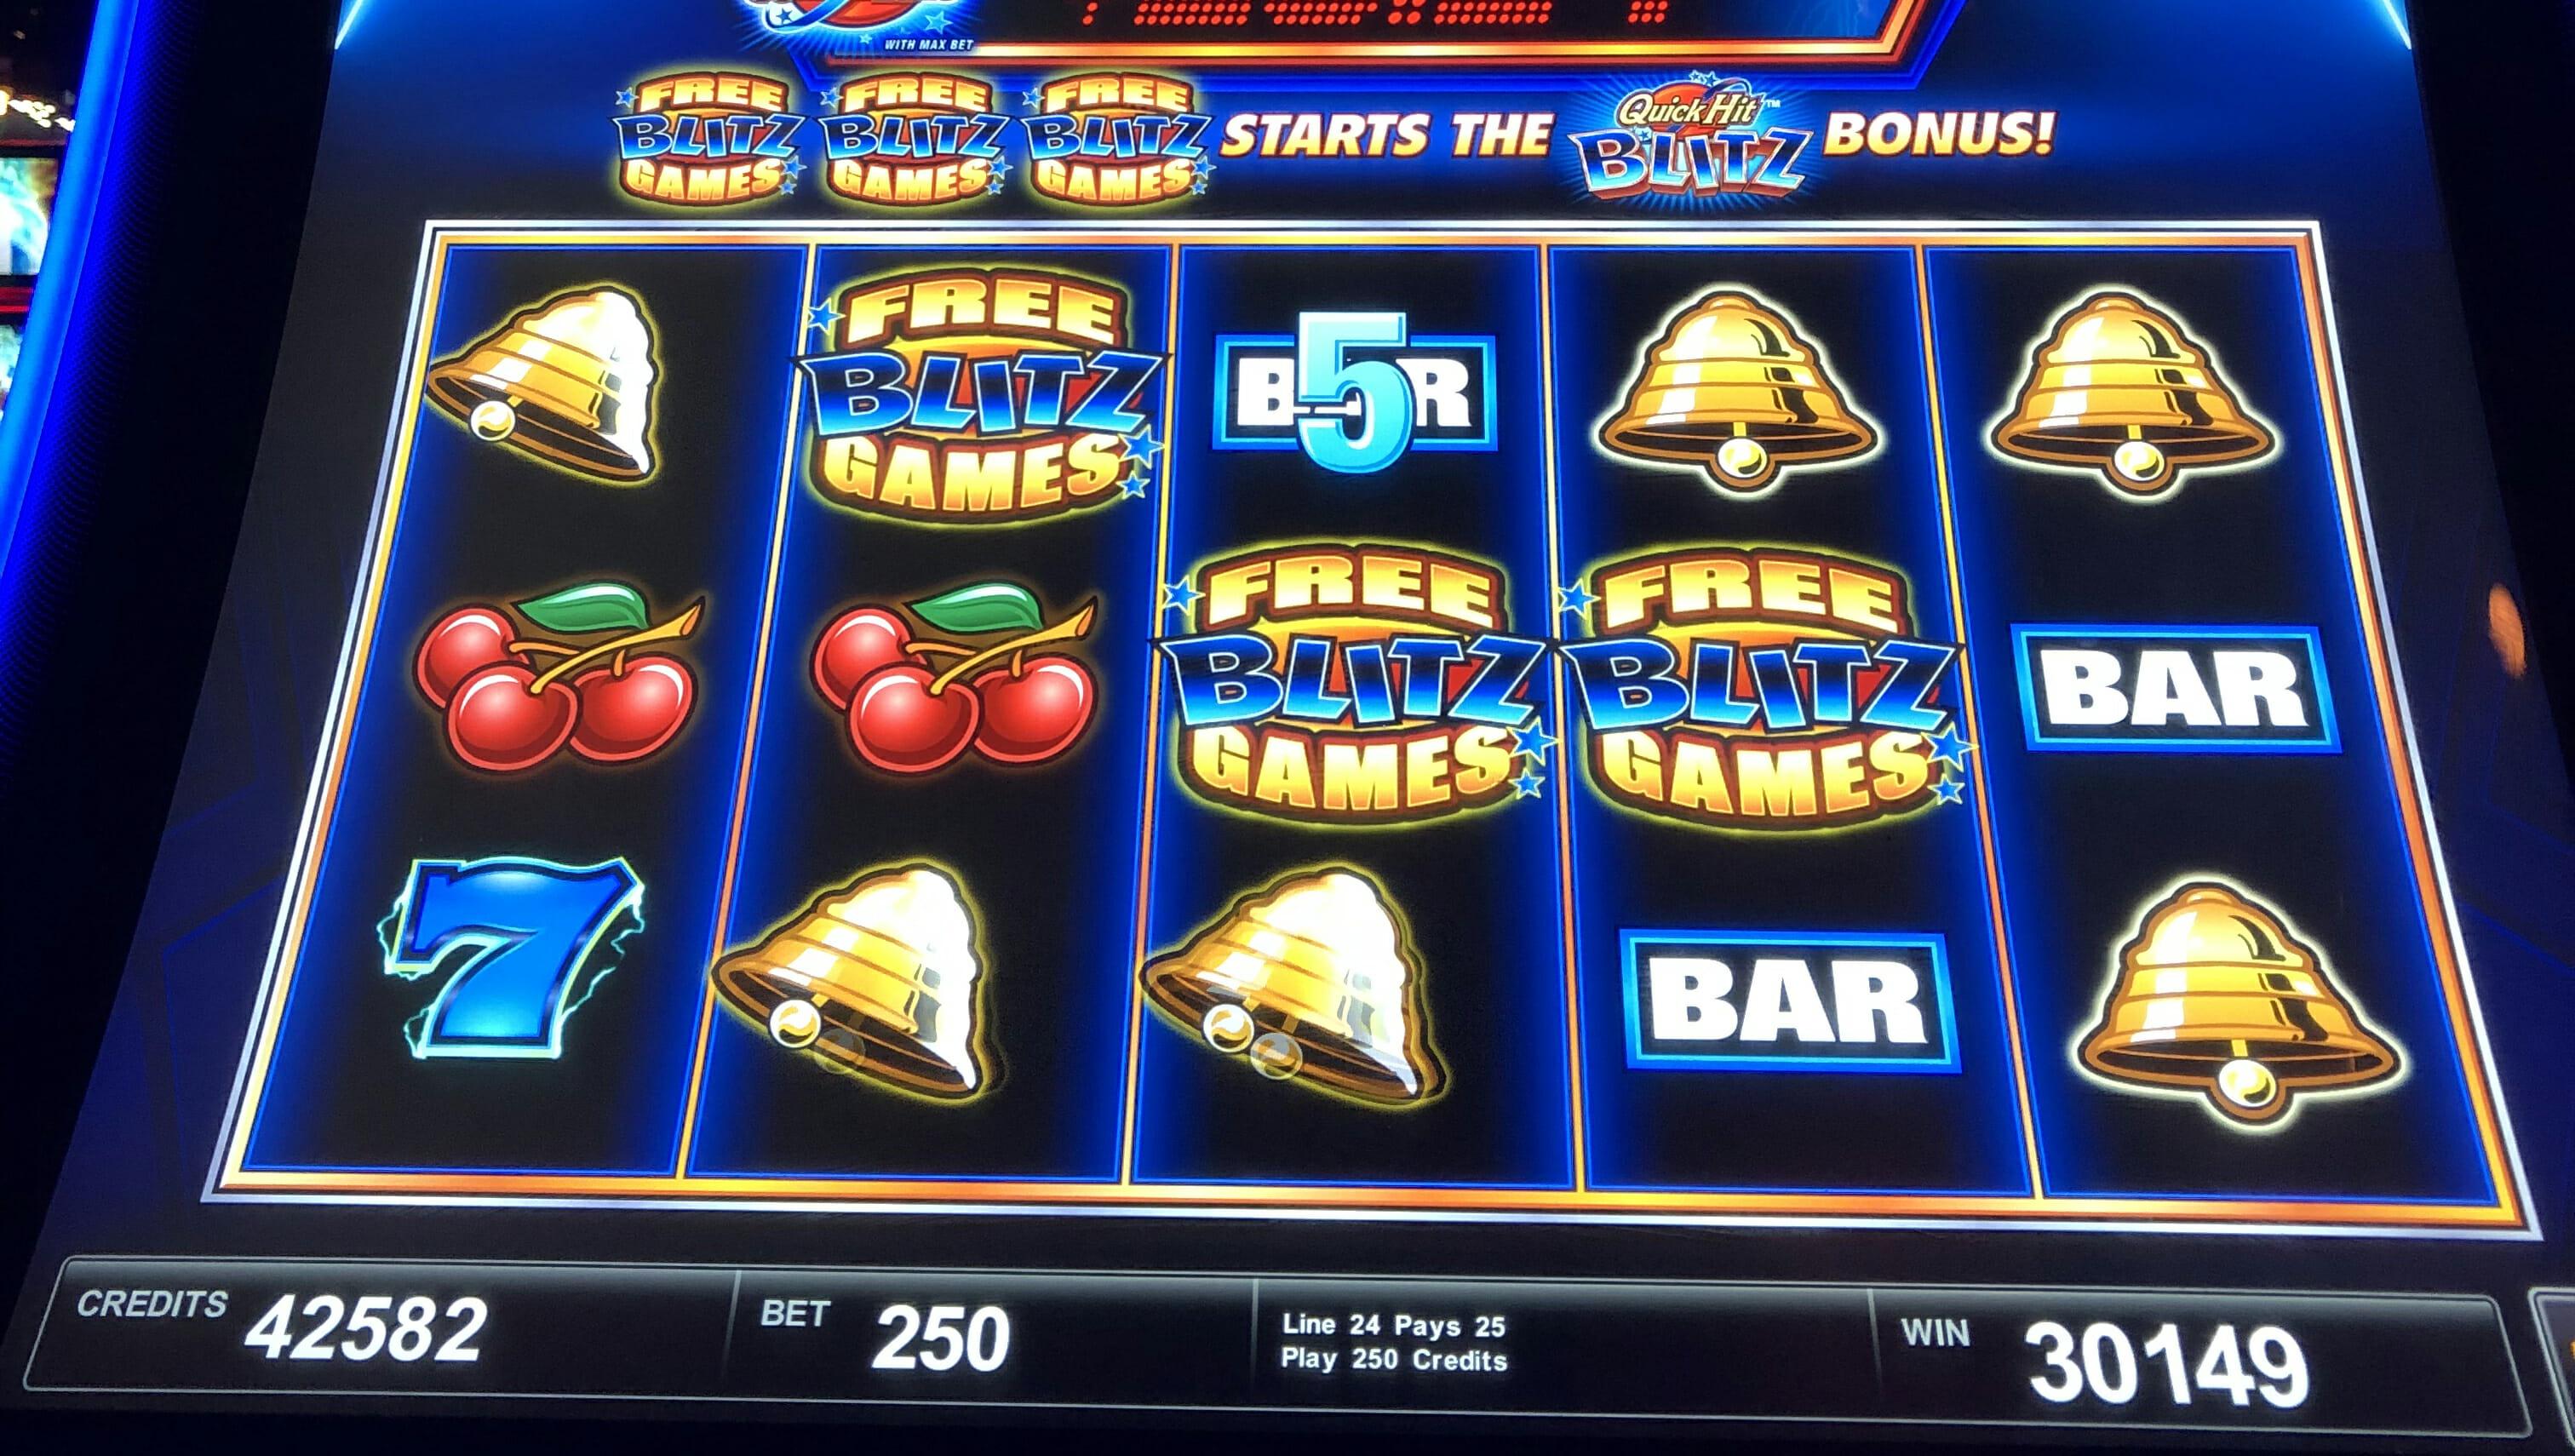 vegas rush casino promo codes 2020